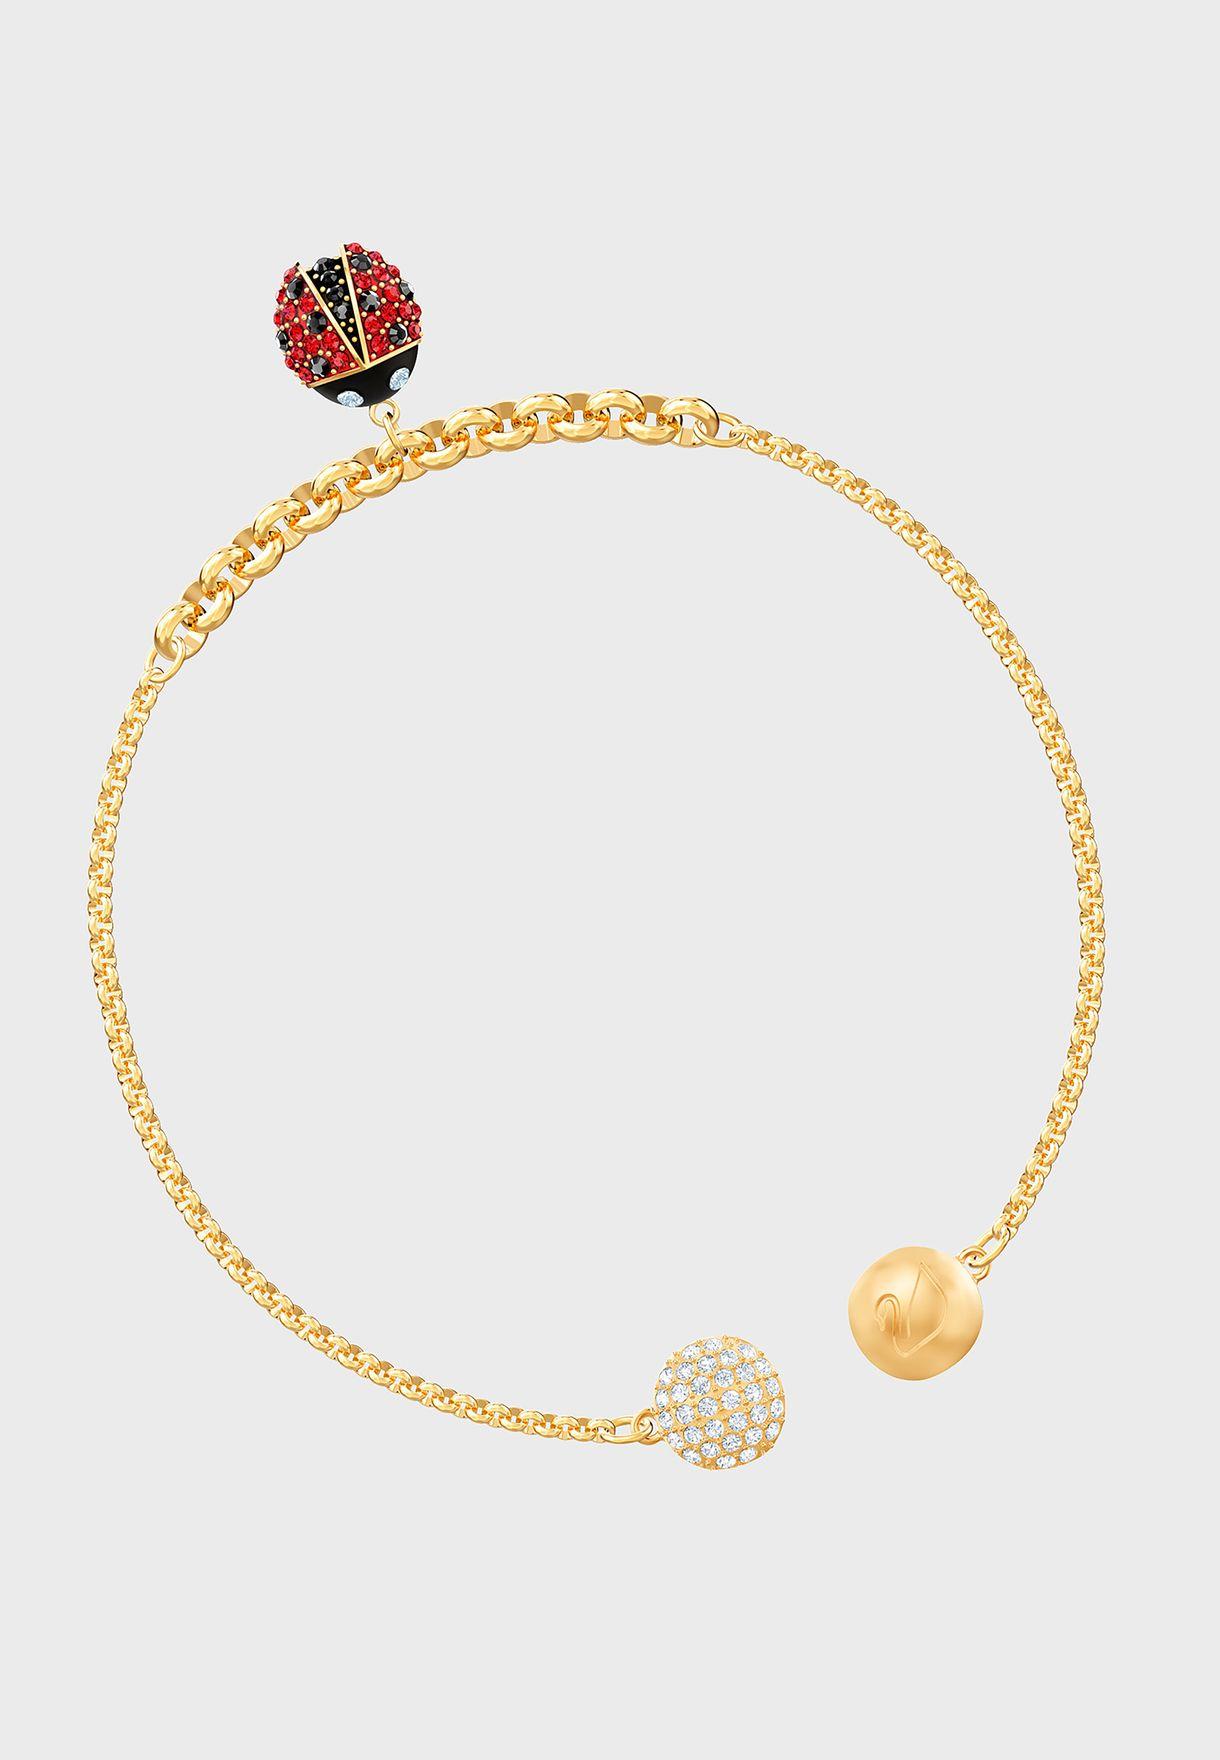 Swarovski Remix Strand Ladybug Bracelet